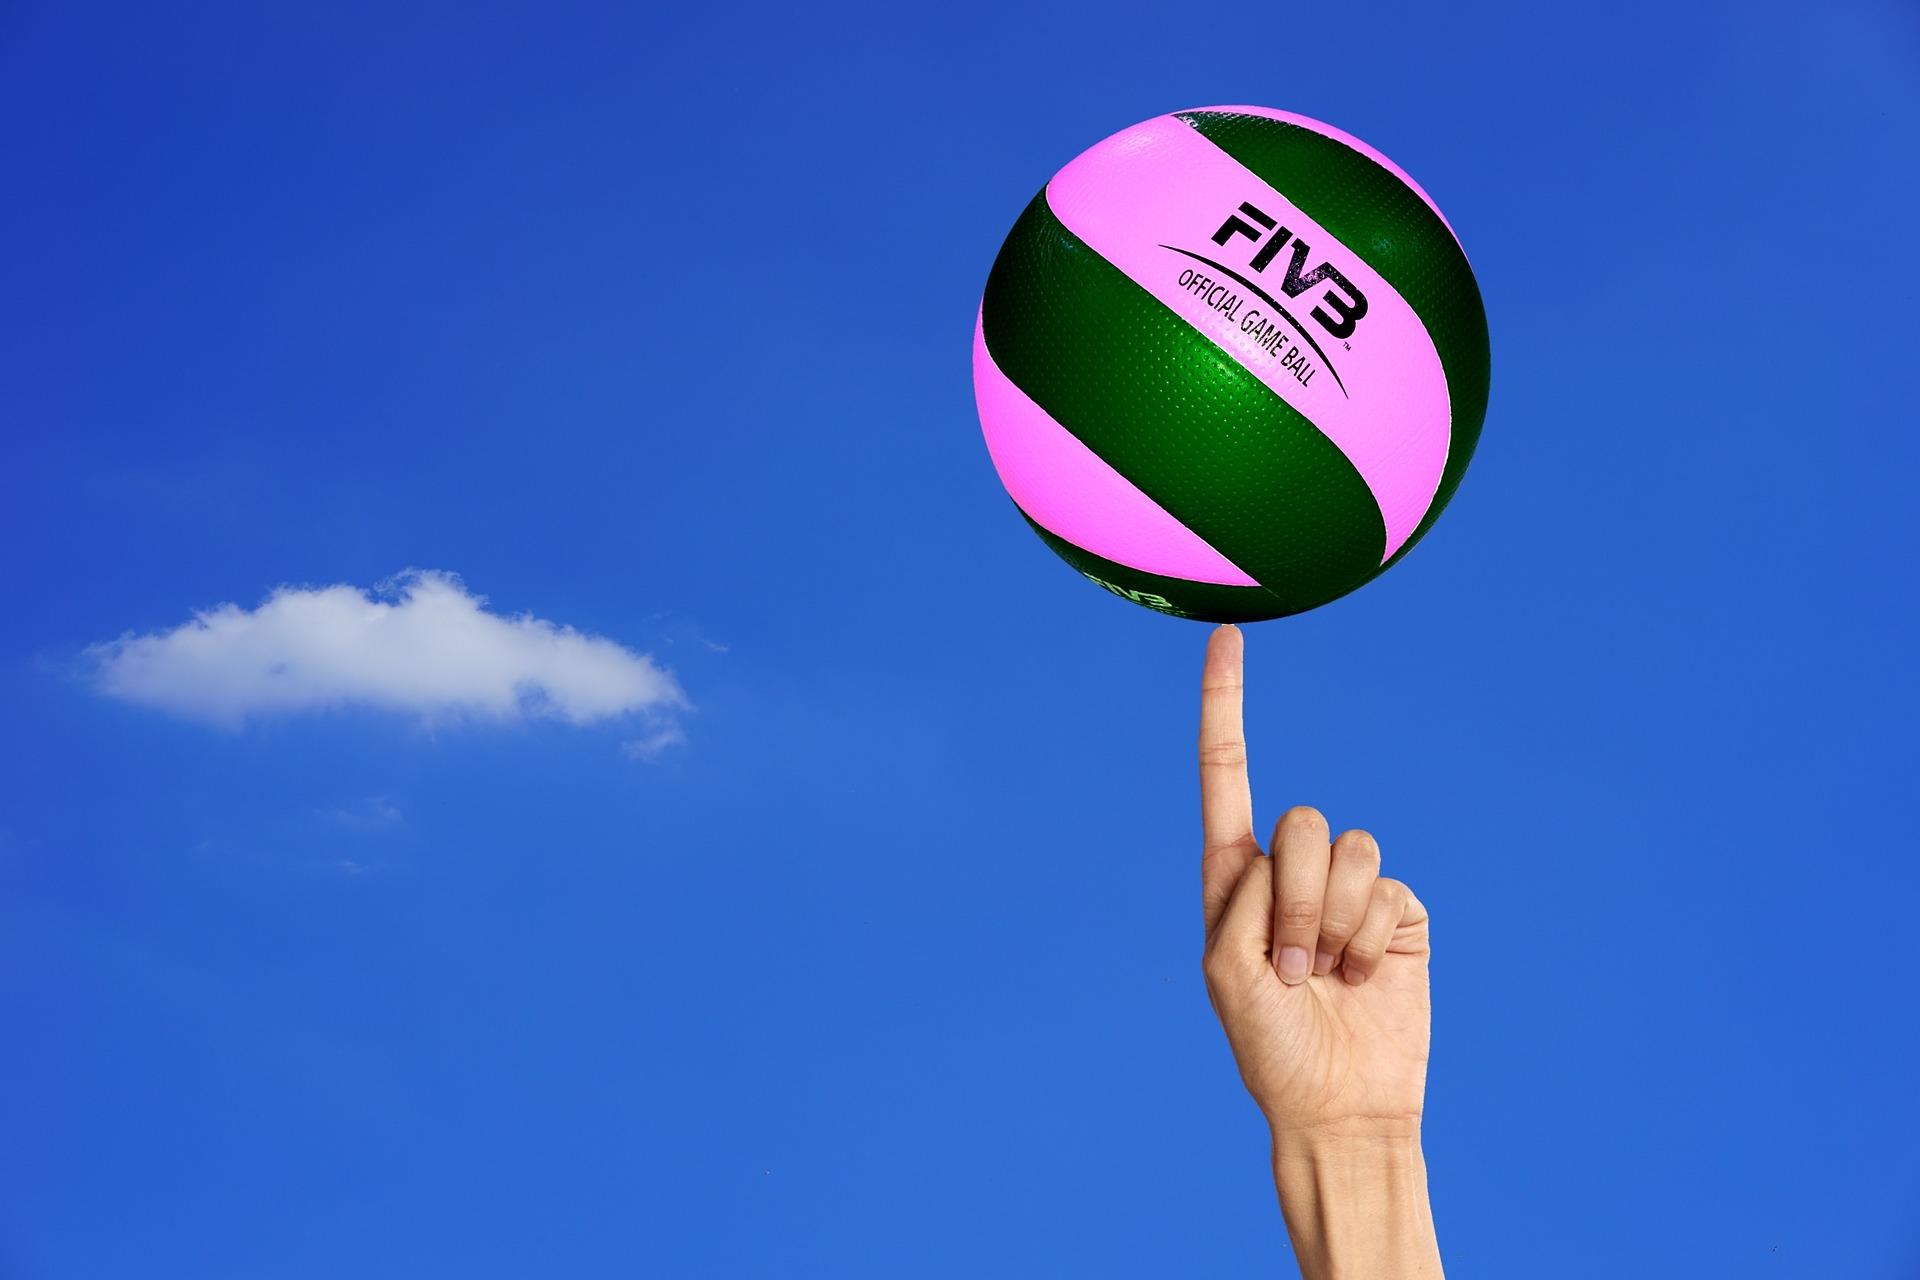 dream-meaning-of-ball - Dream Interpretation - photo#50